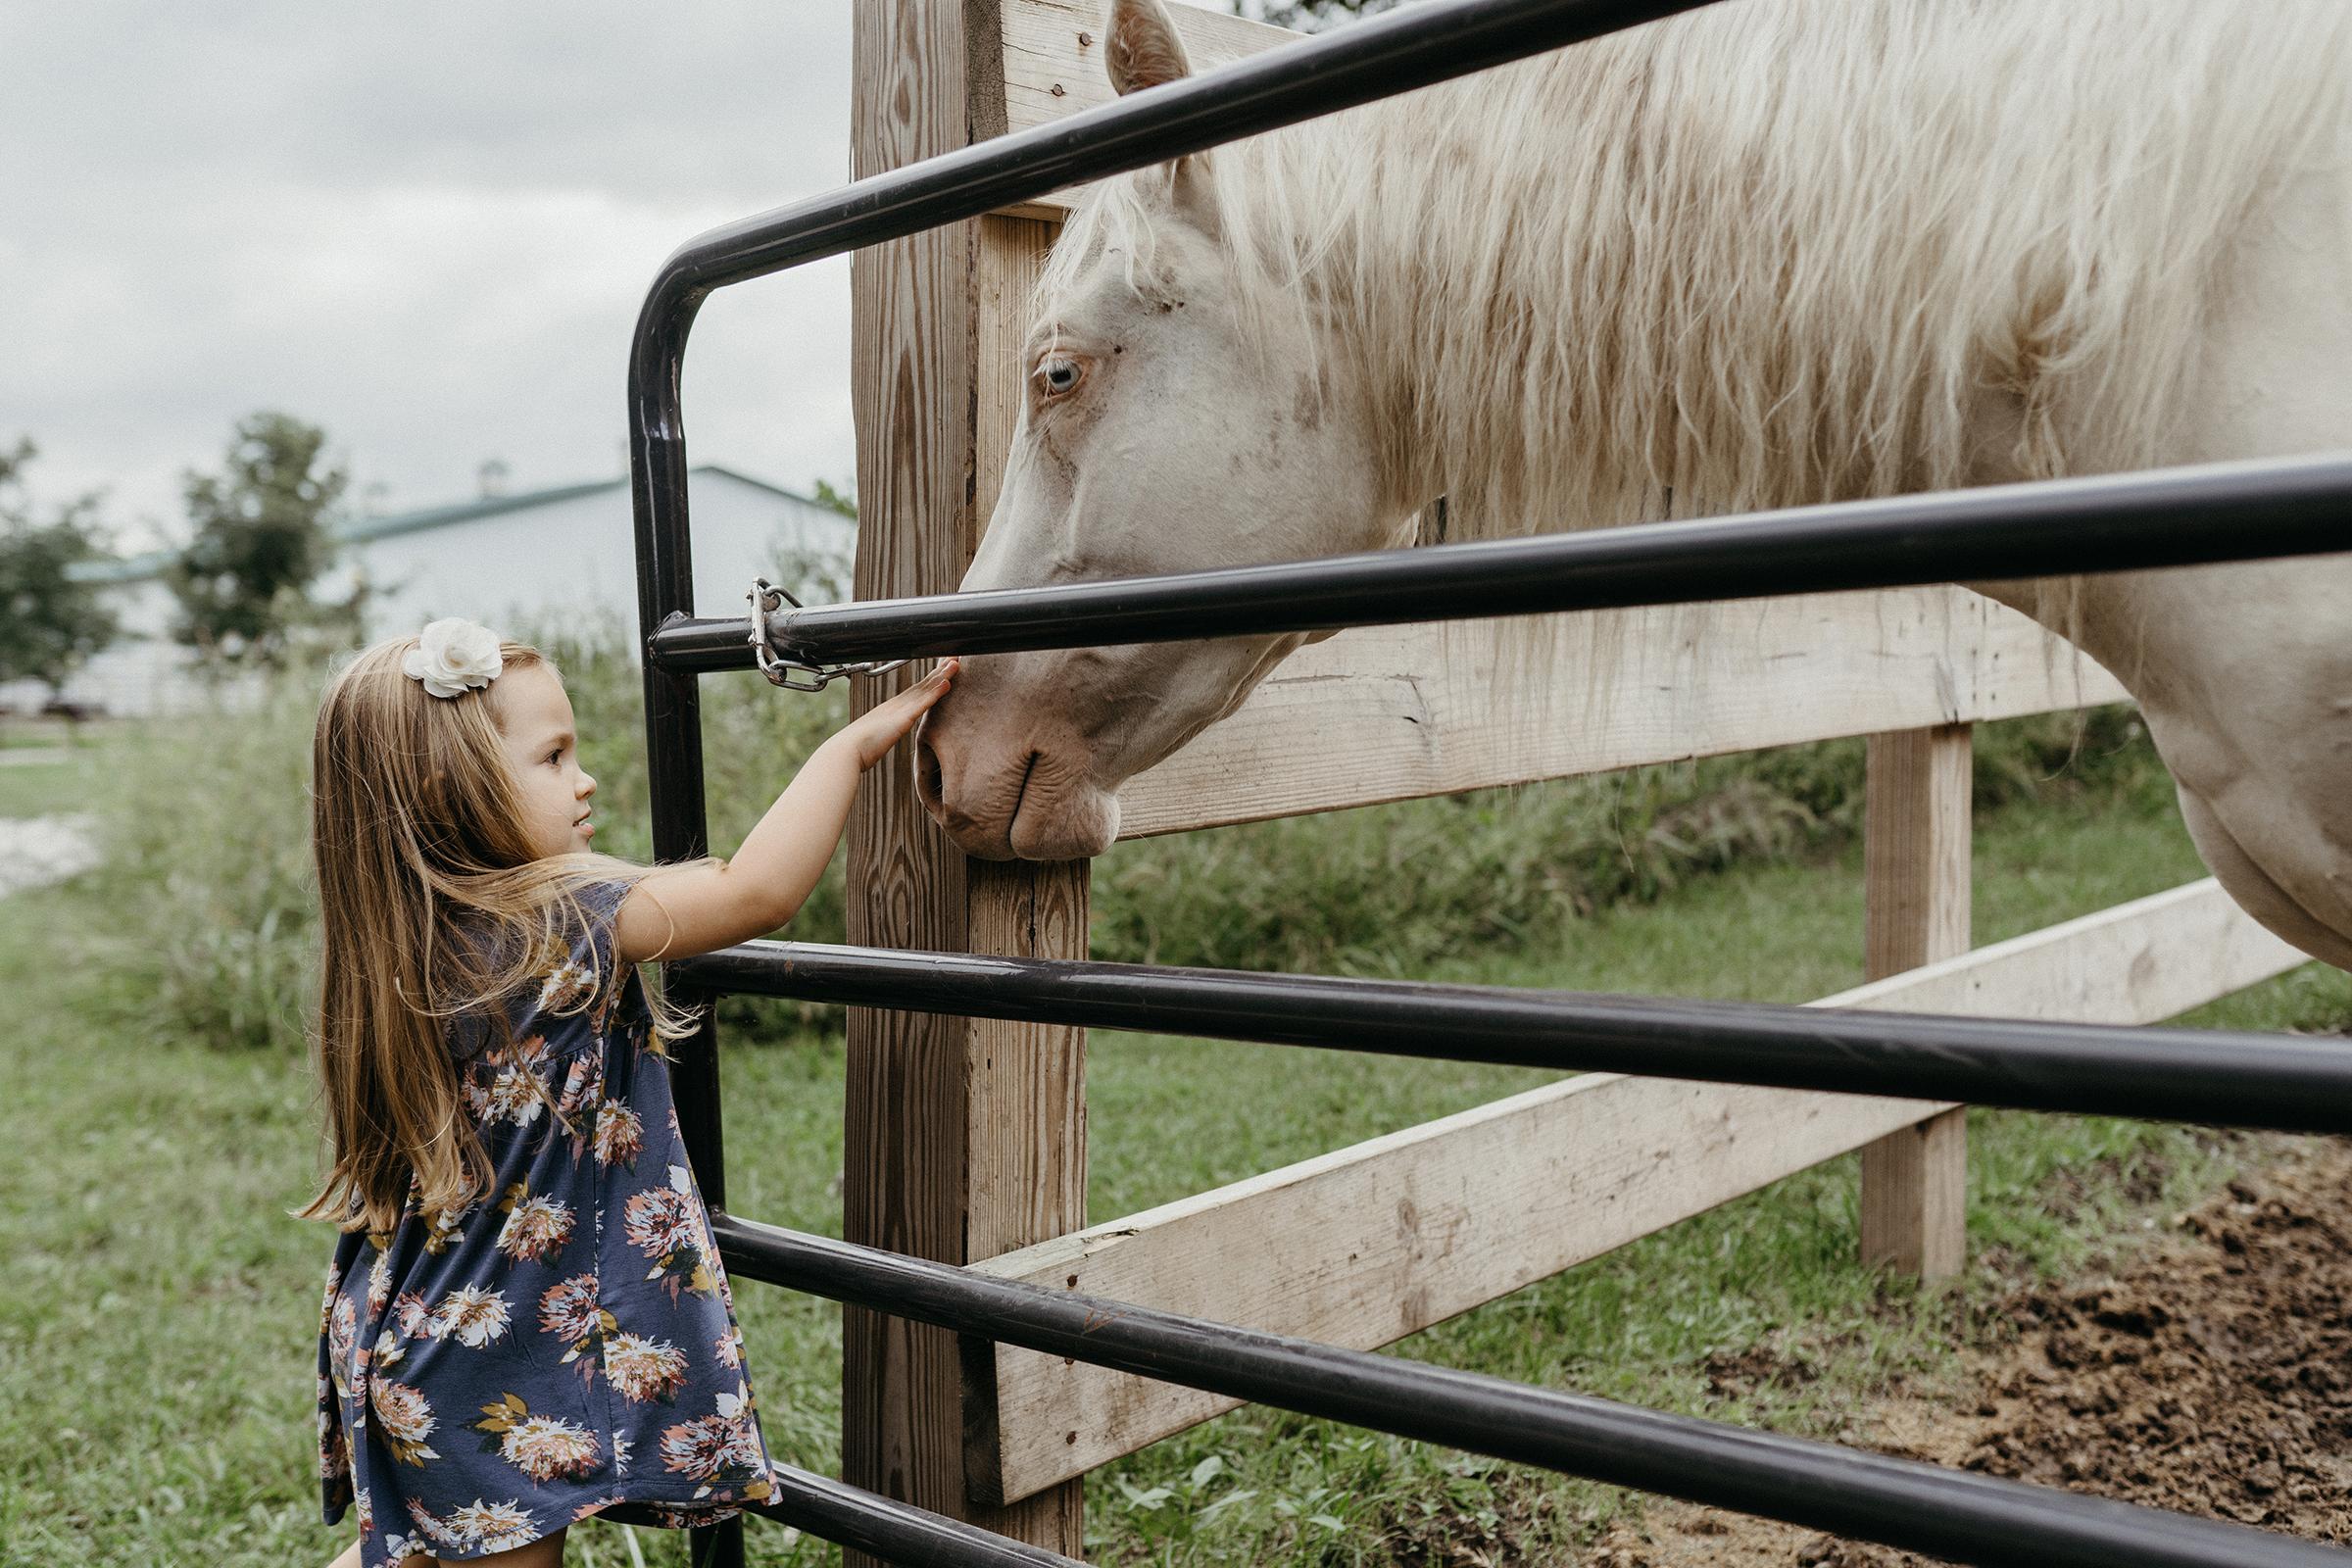 mueller-family-child-petting-white-horse-granger-iowa-raelyn-ramey-photography.jpg